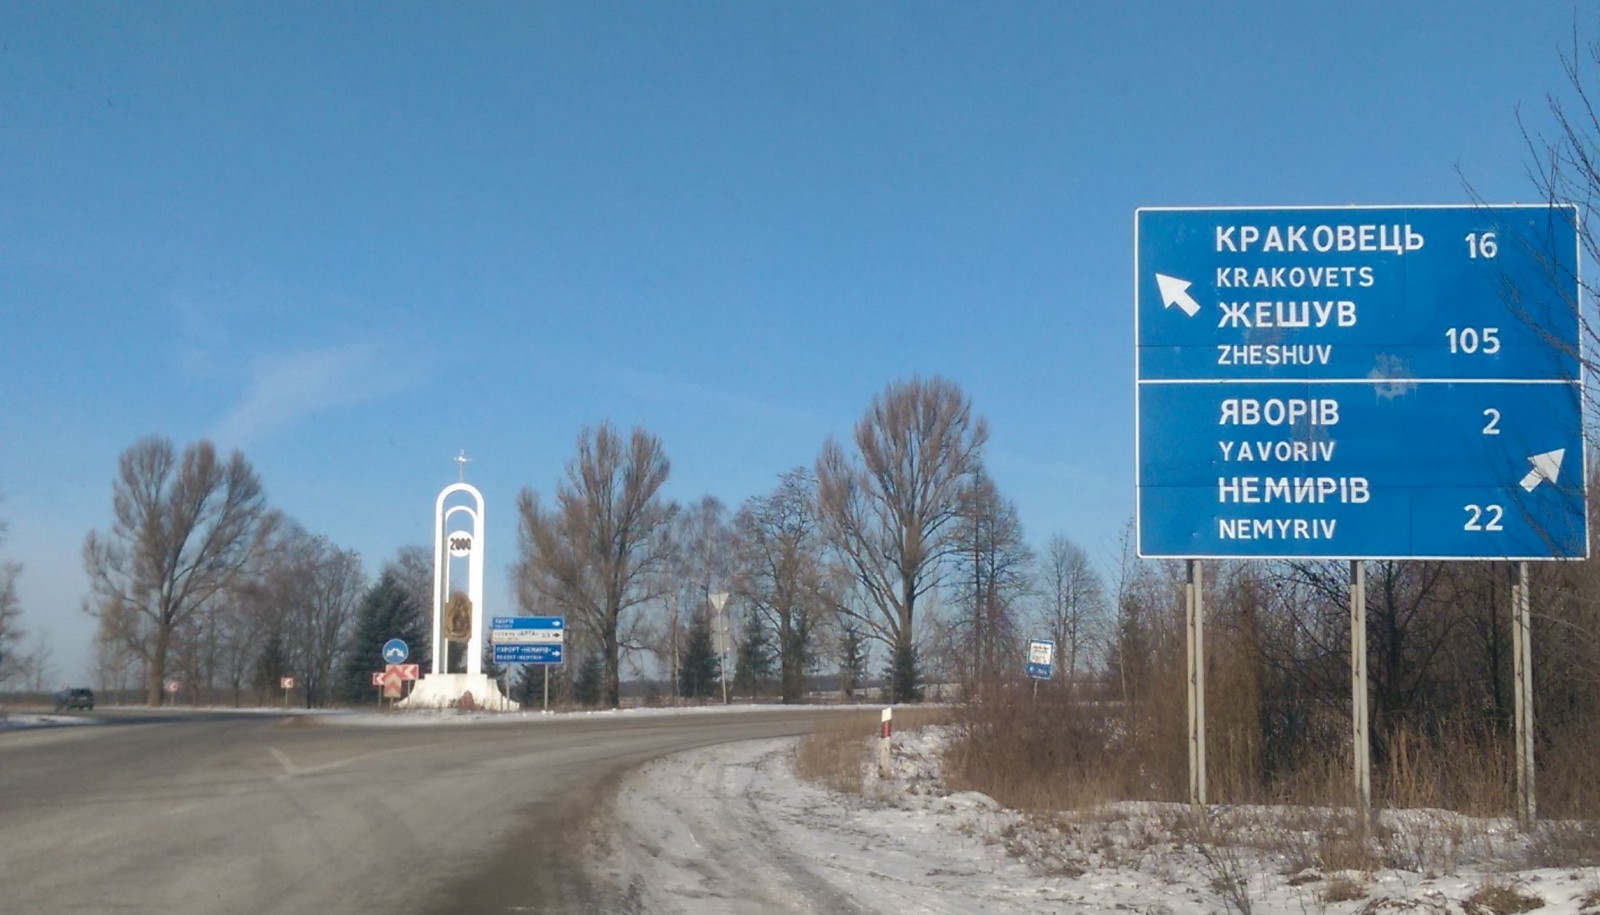 пункт пропуска Краковец